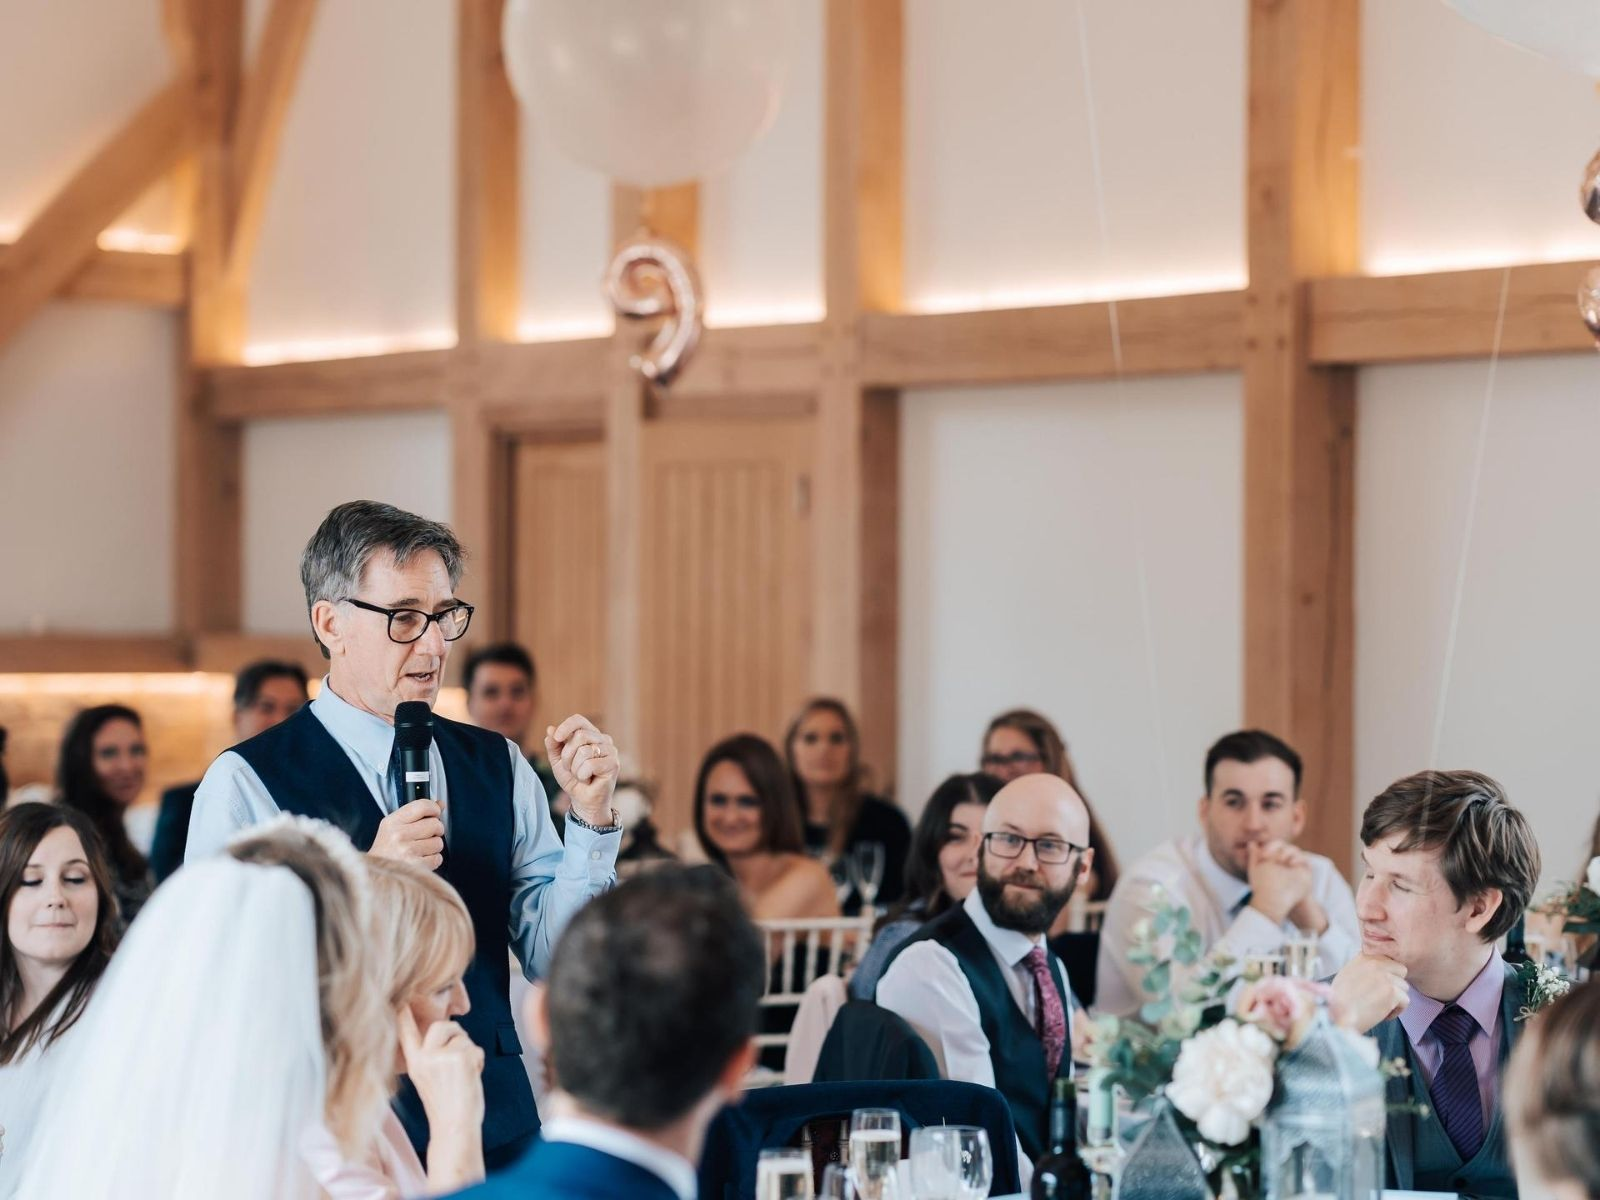 Wedding speeches at barn wedding in UK